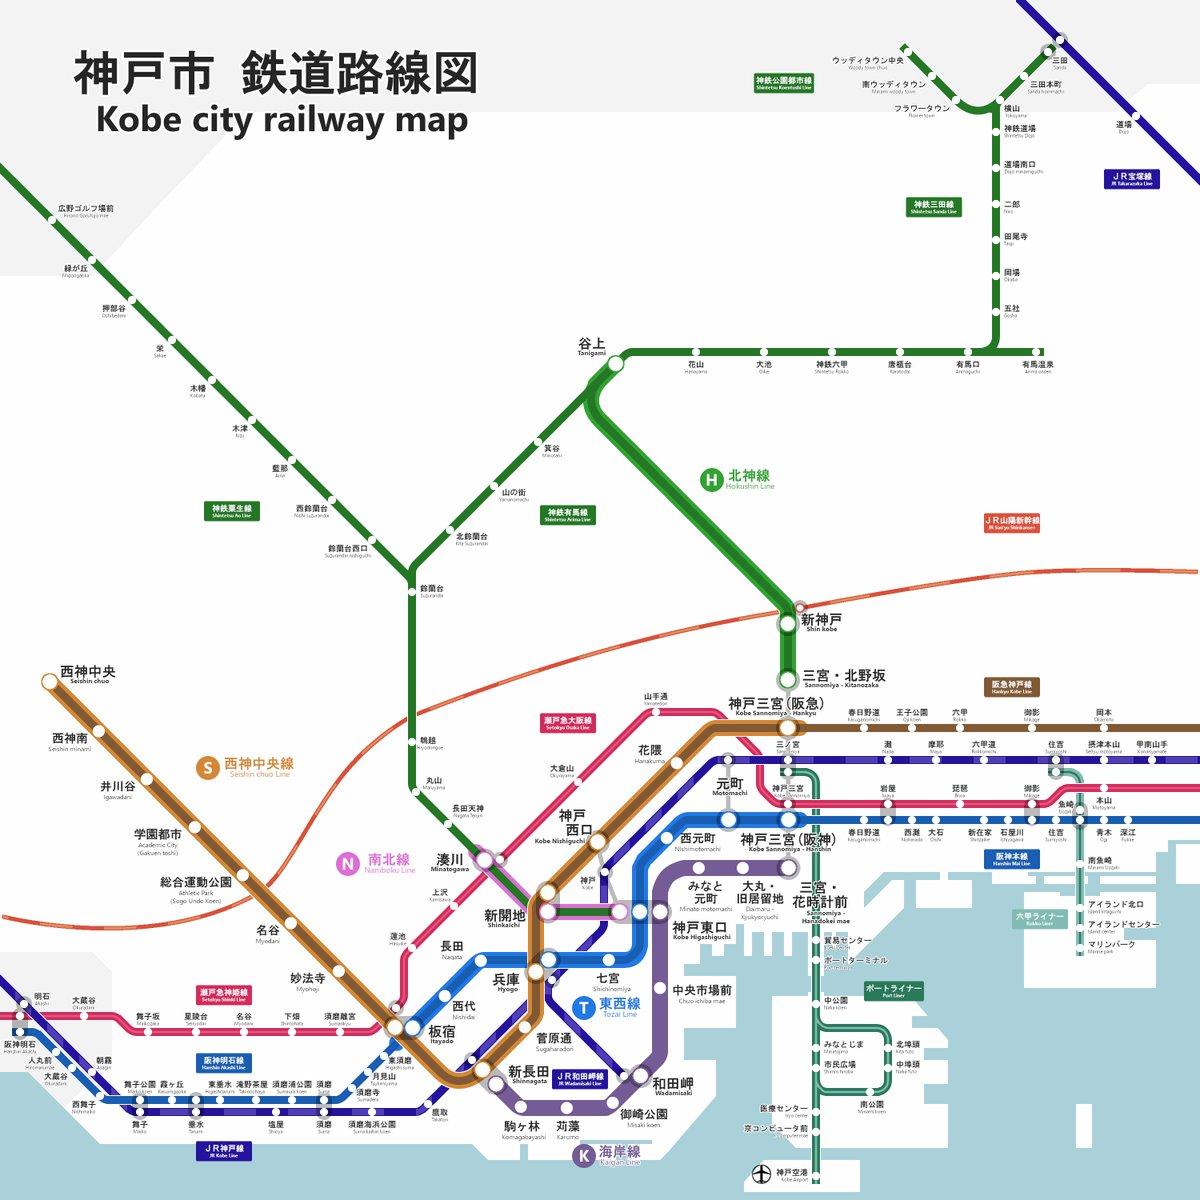 "🚄 on Twitter: ""ようやく完成。瀬戸急世界の神戸市鉄道路線図です ..."